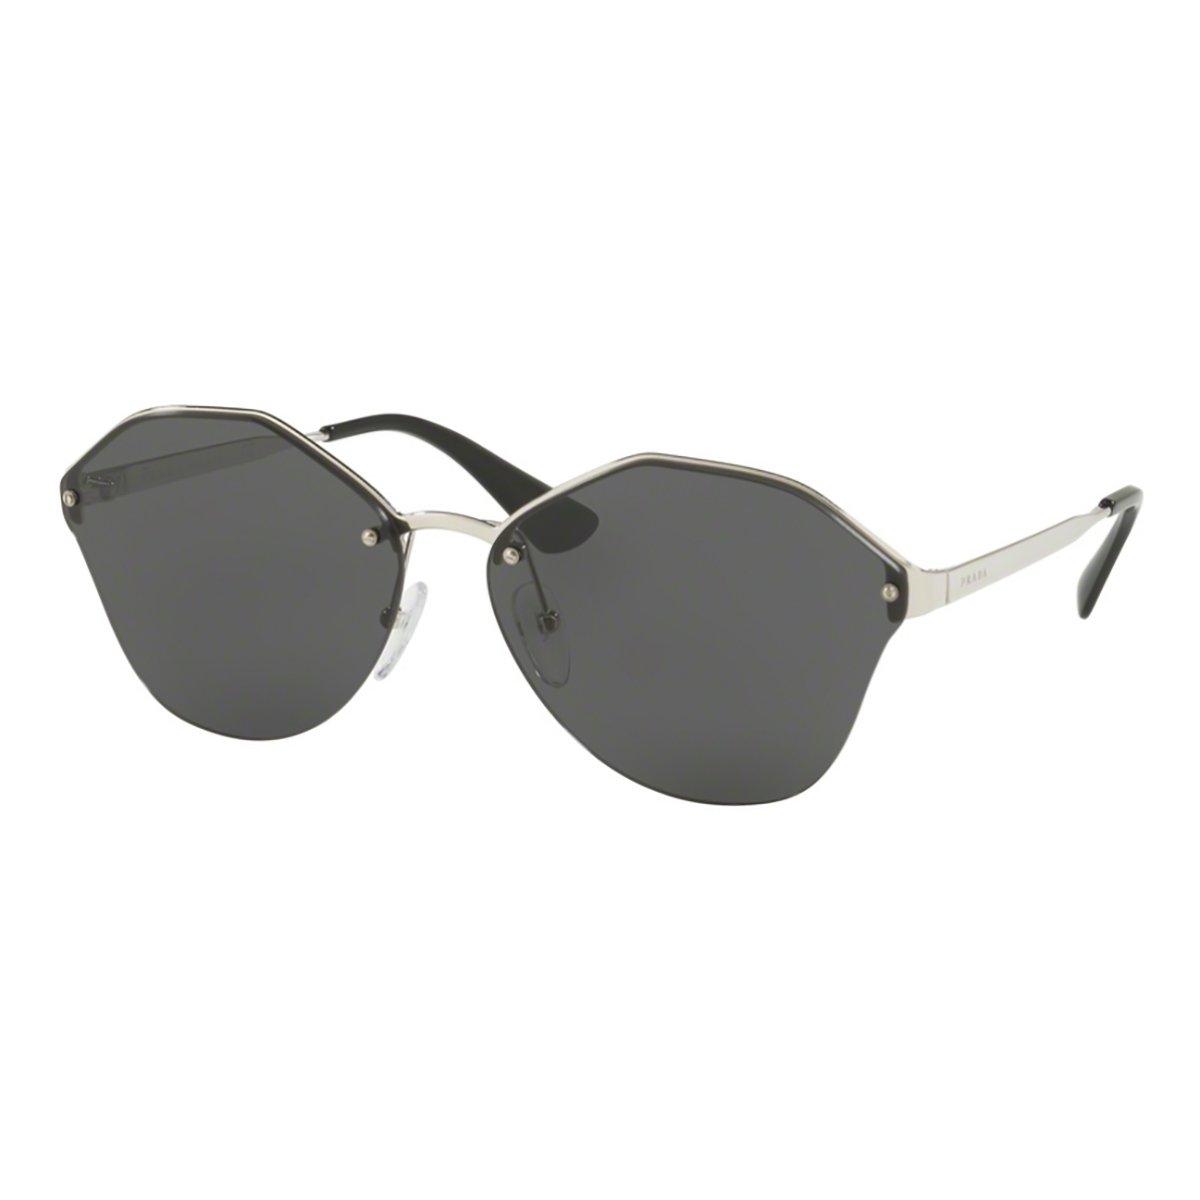 Compre Óculos de Sol Prada em 10X   Tri-Jóia Shop 0bcdeb93d1